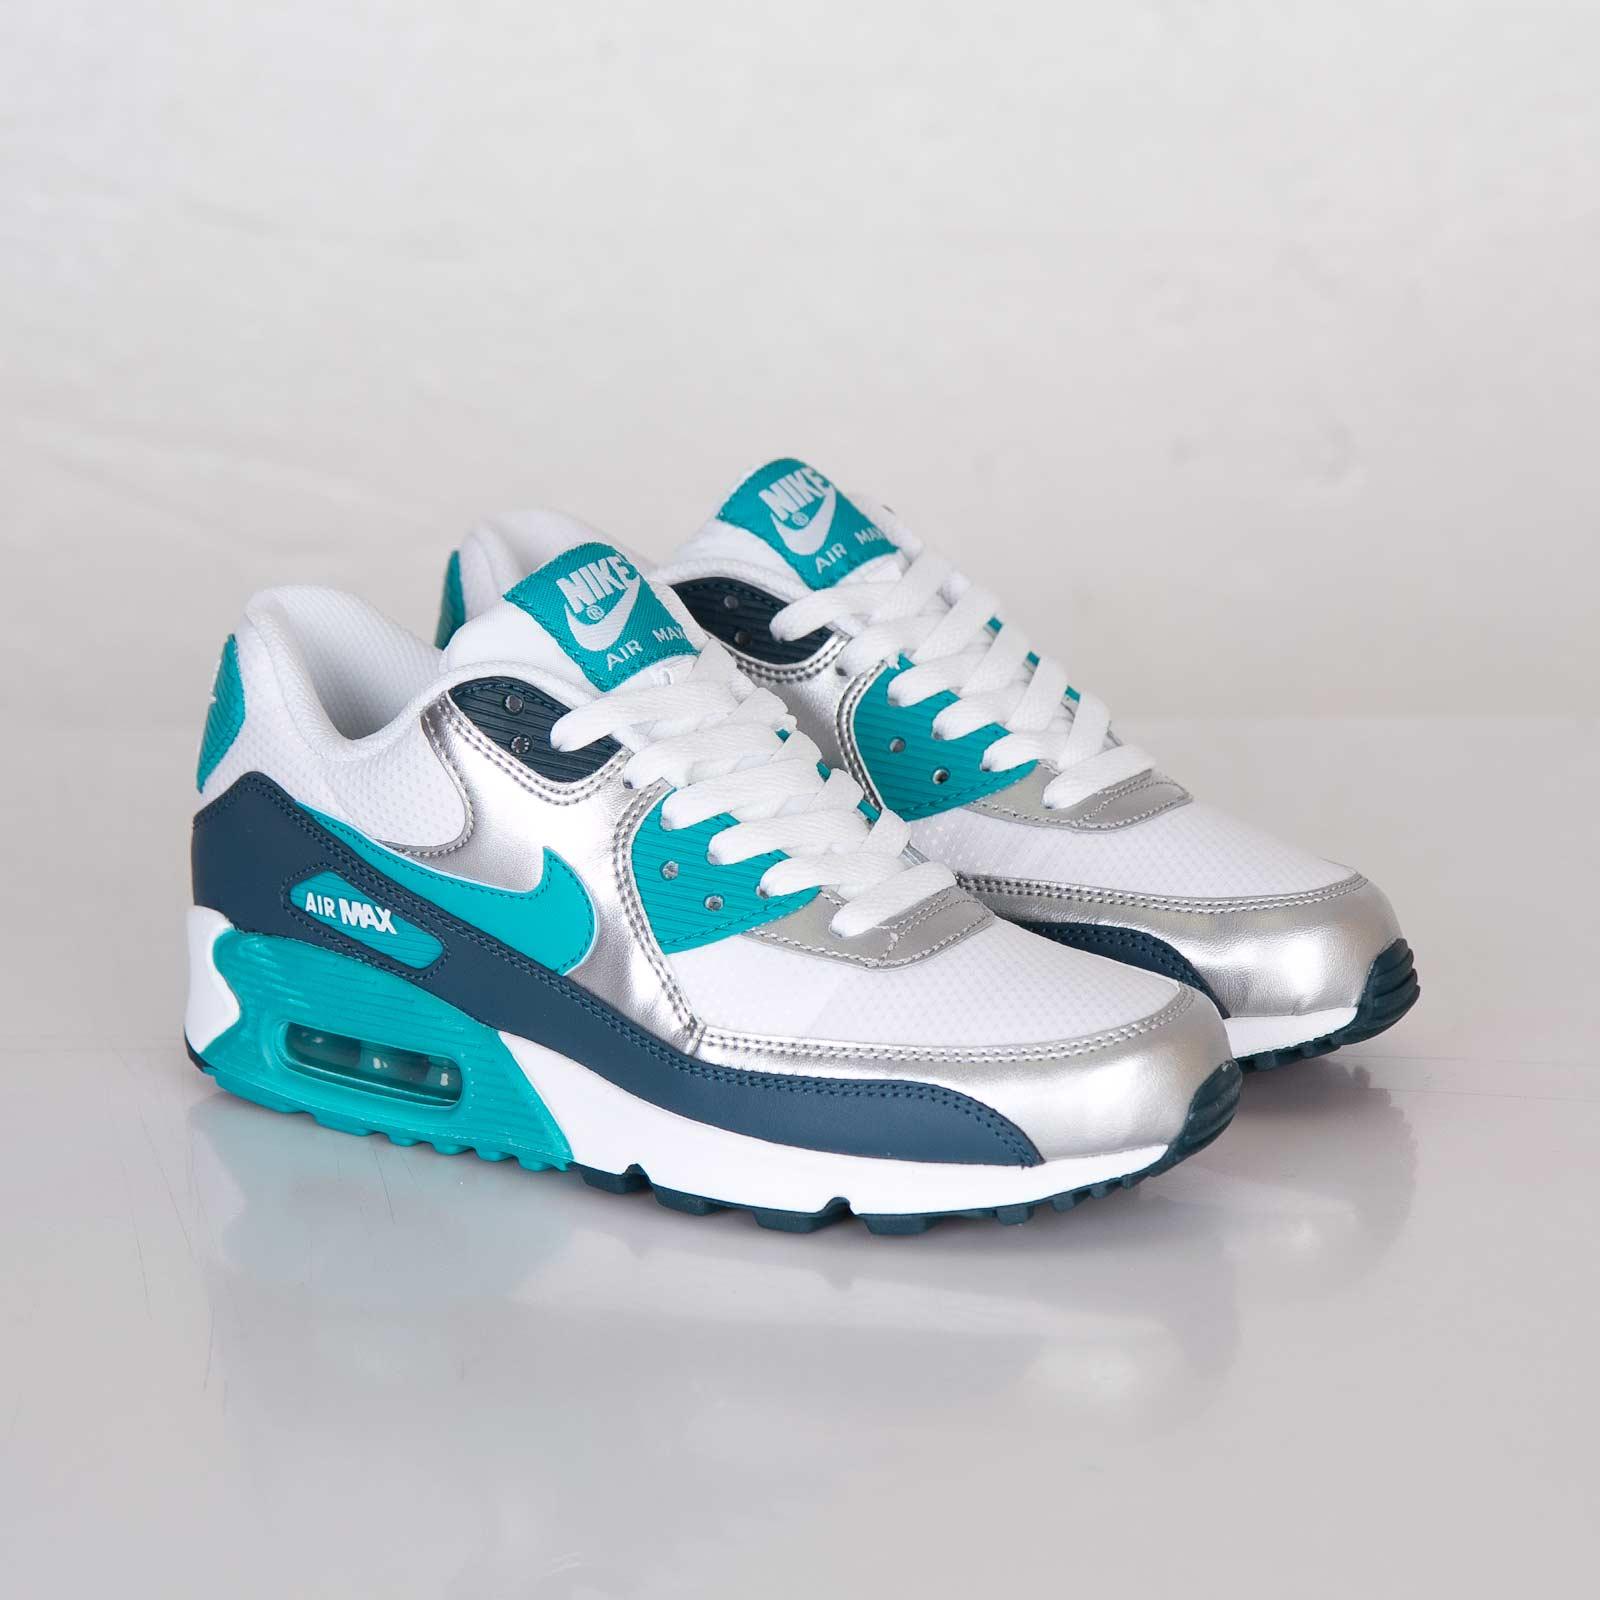 detailed look 125fa ffa0c Nike Wmns Air Max 90 Essential - 616730-105 - Sneakersnstuff ...